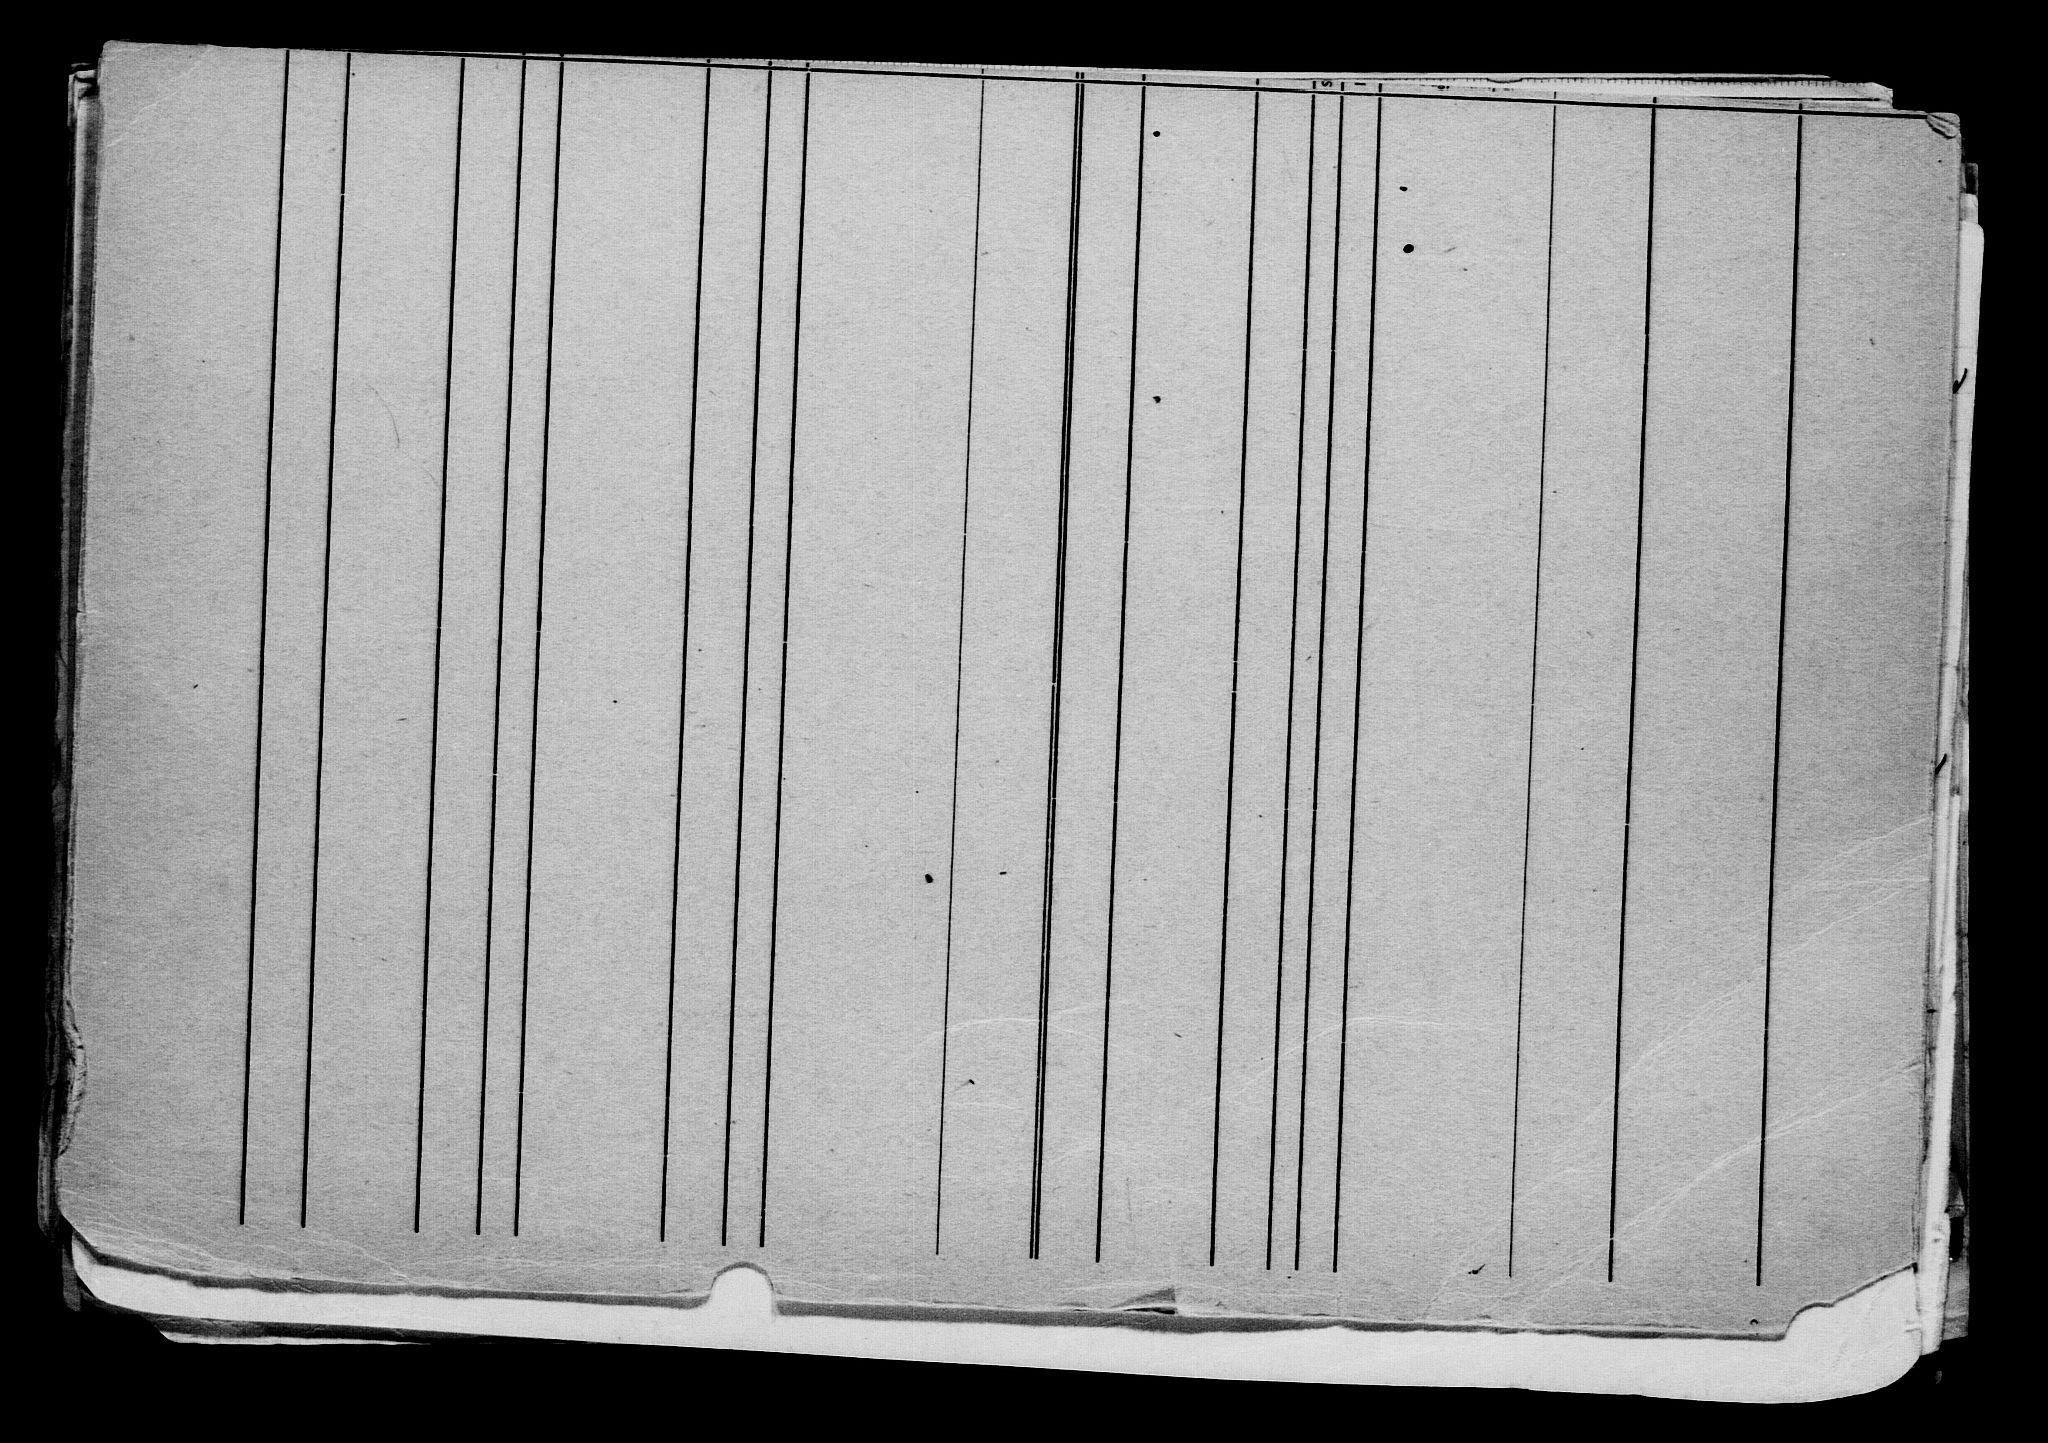 RA, Direktoratet for sjømenn, G/Gb/L0045: Hovedkort, 1902, s. 8